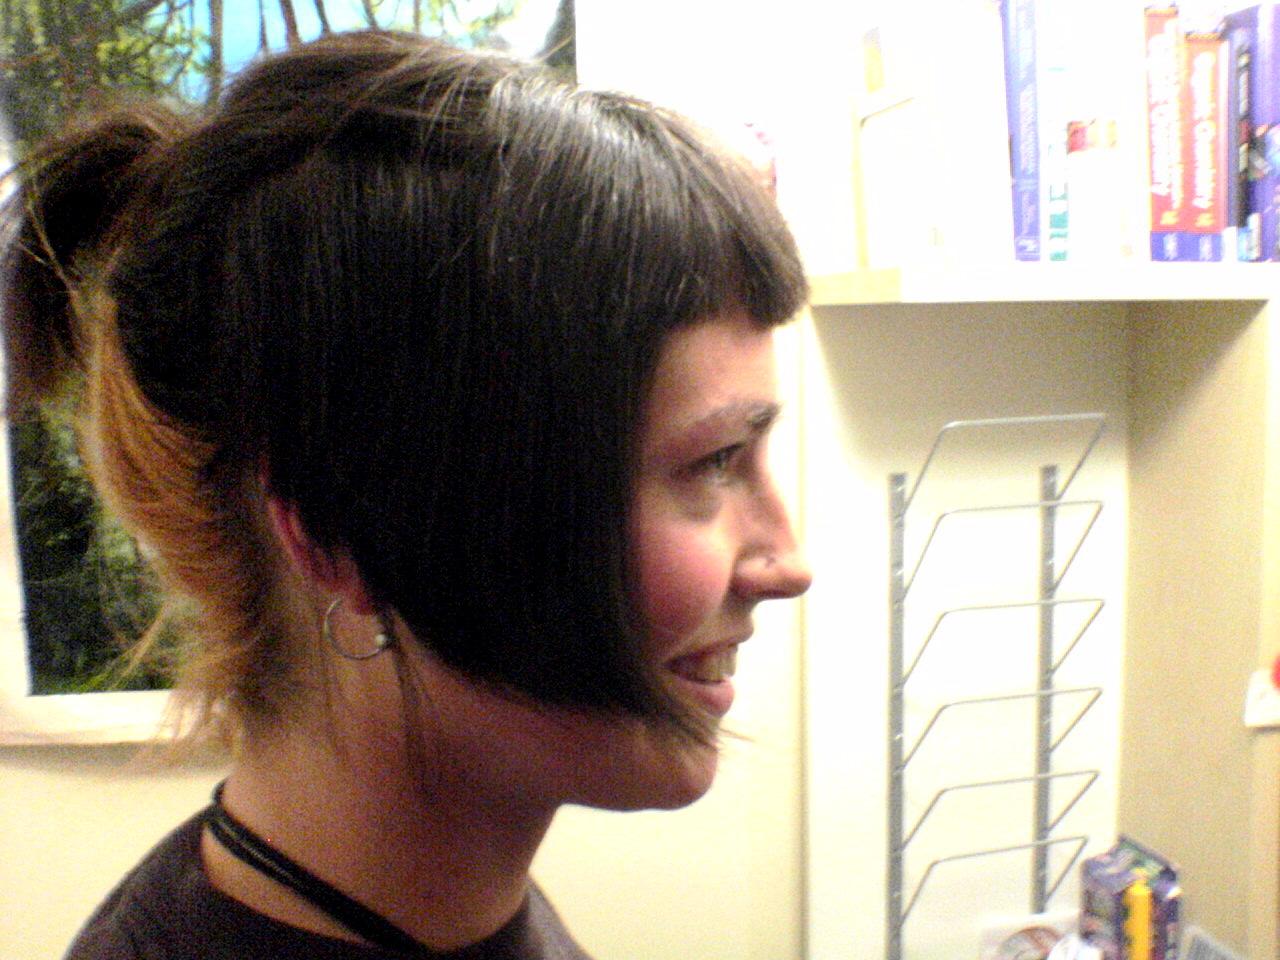 Extreme Haircut Video